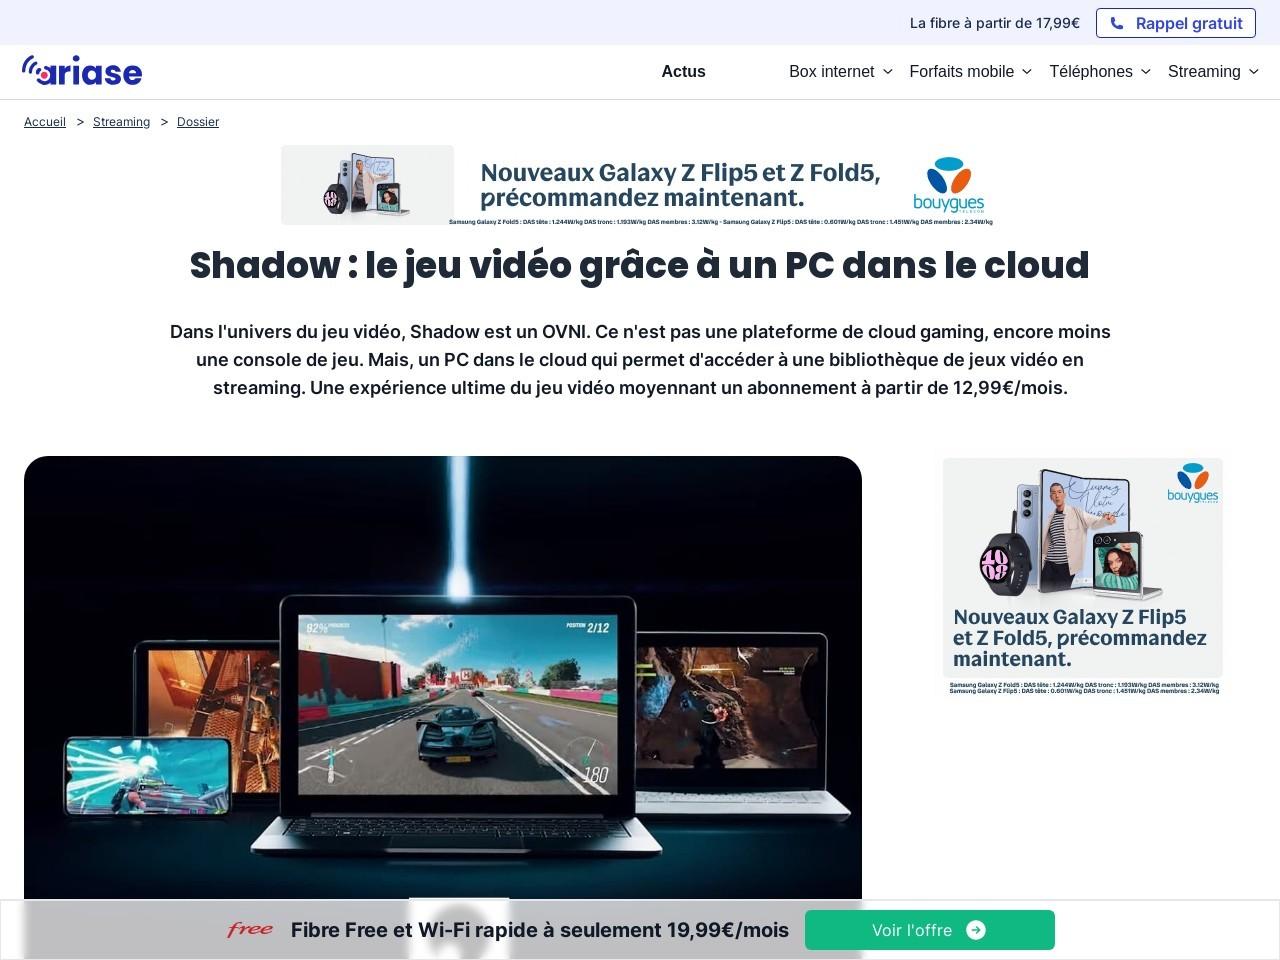 Blacknut, Shadow, Nvidia, PlayStation, Stadia : quel débit faut ...